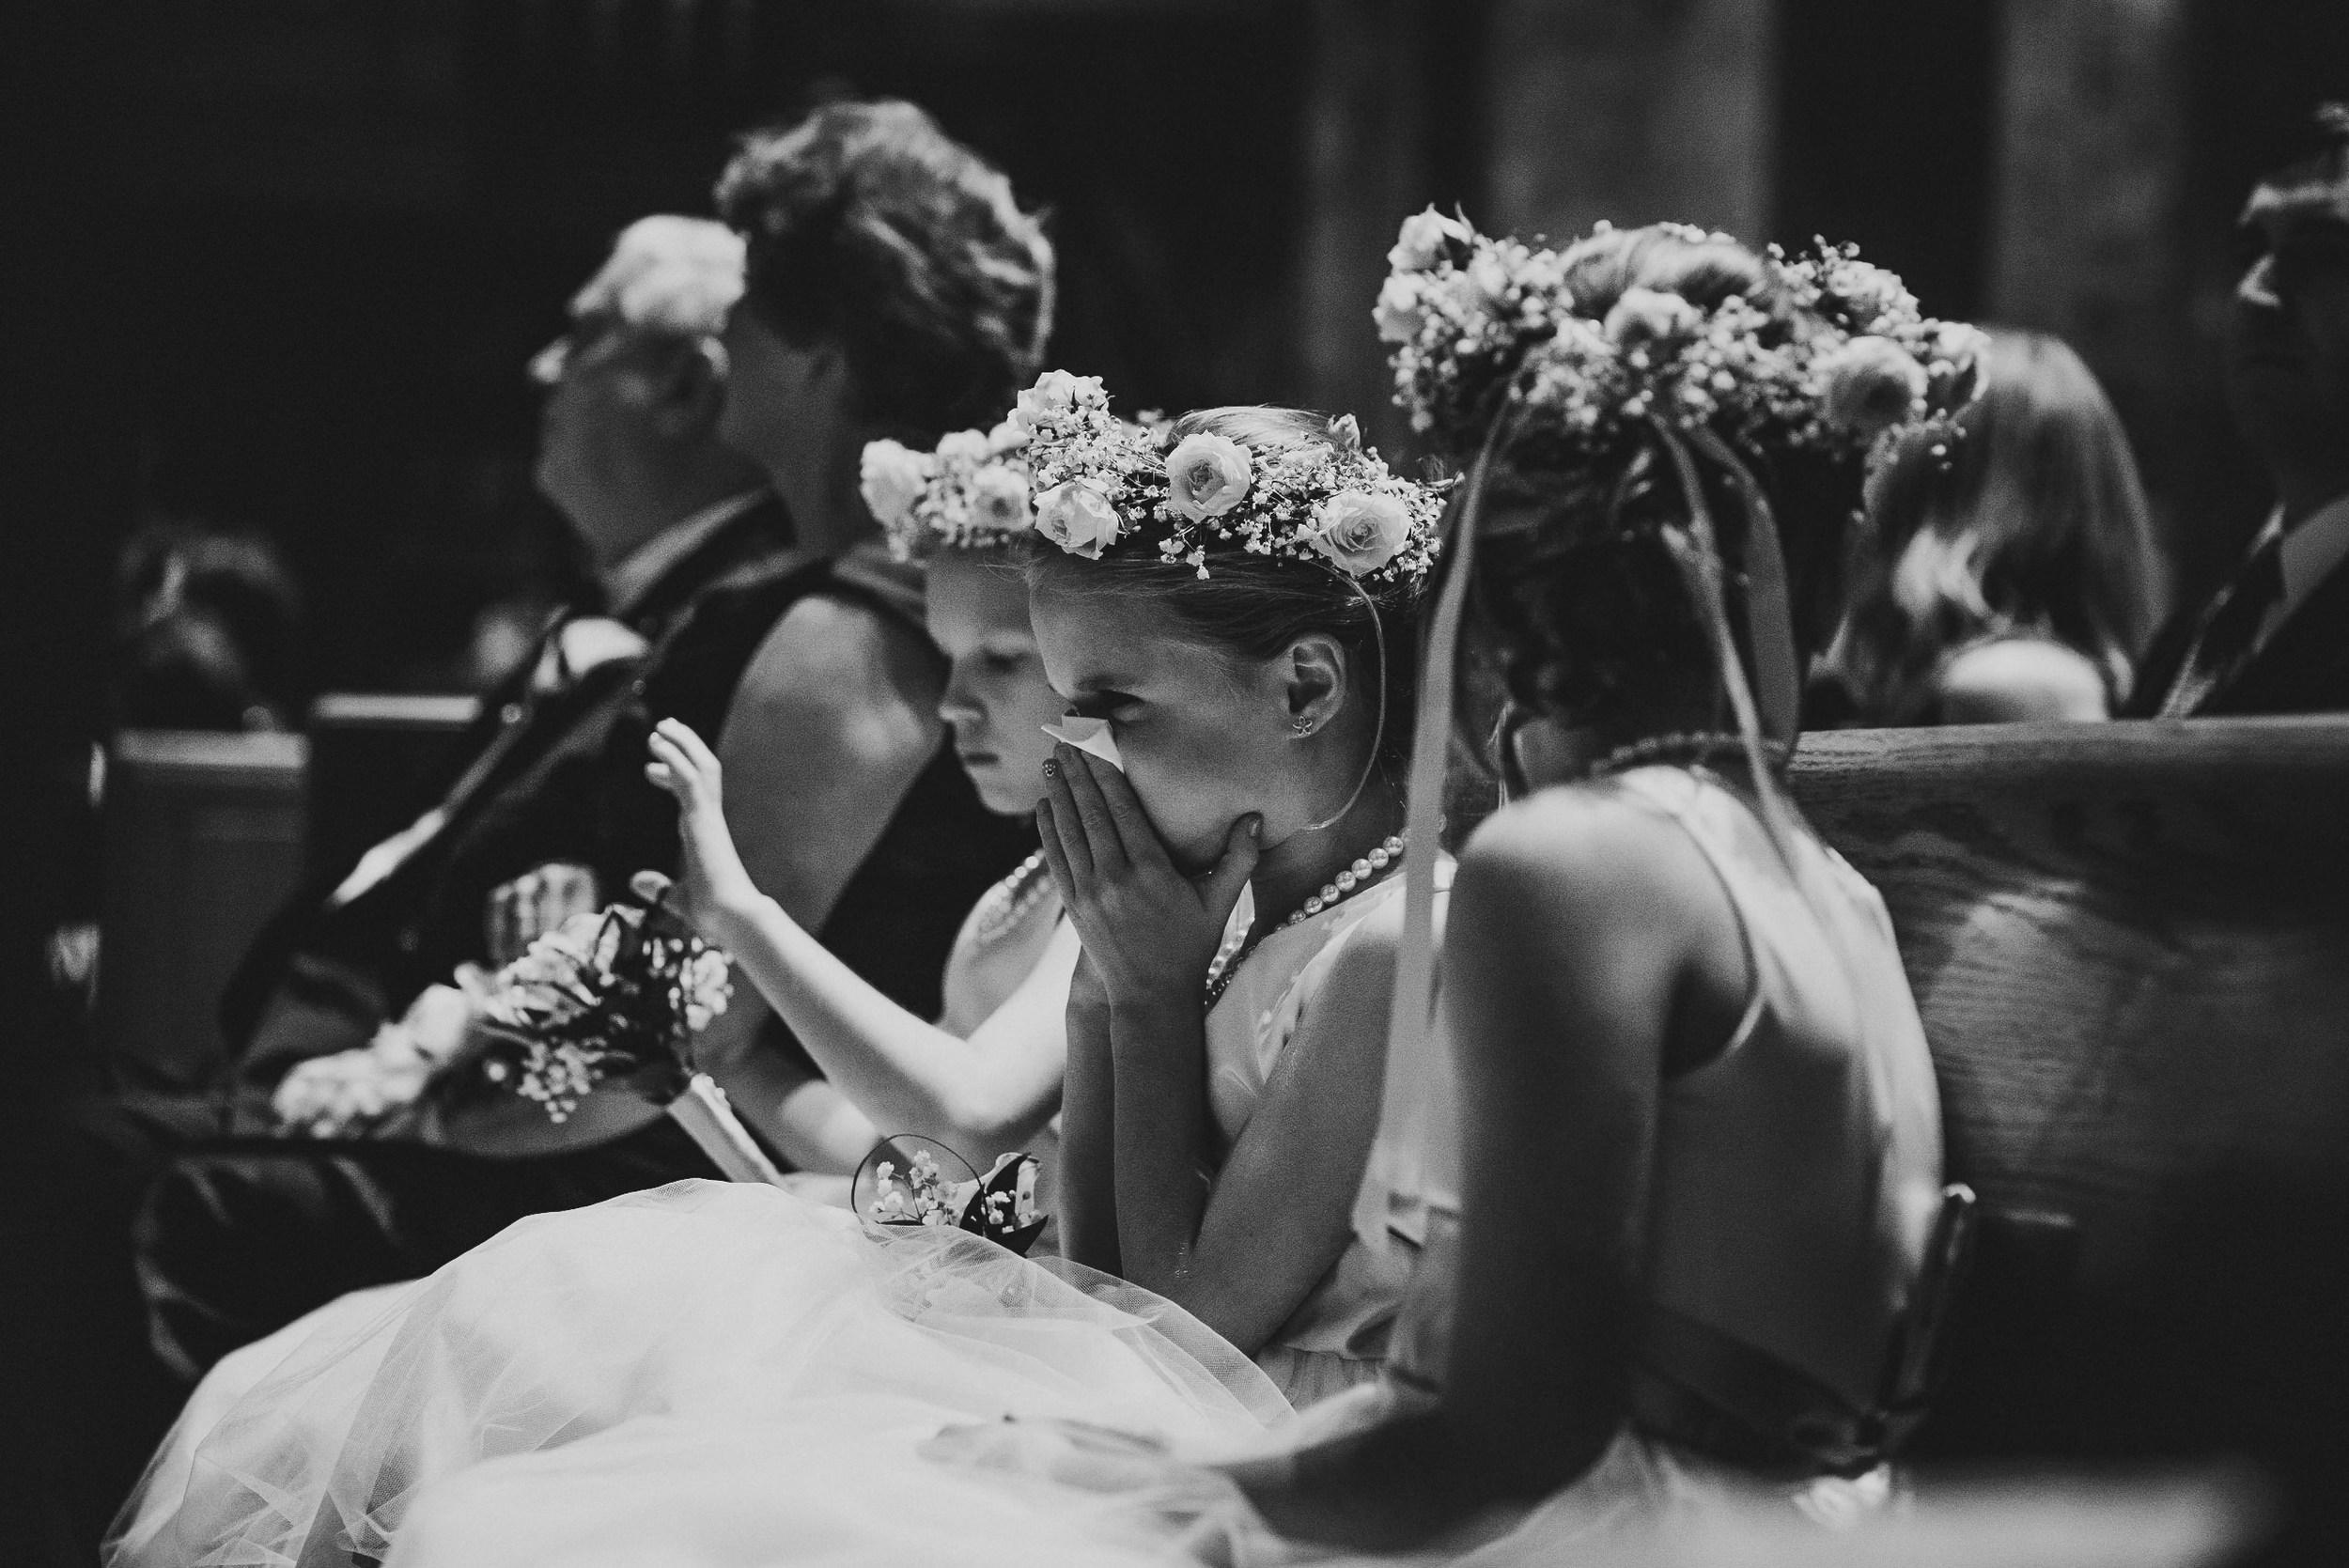 Wedding at W Hotel Washington DC by Mantas Kubilinskas-17.jpg